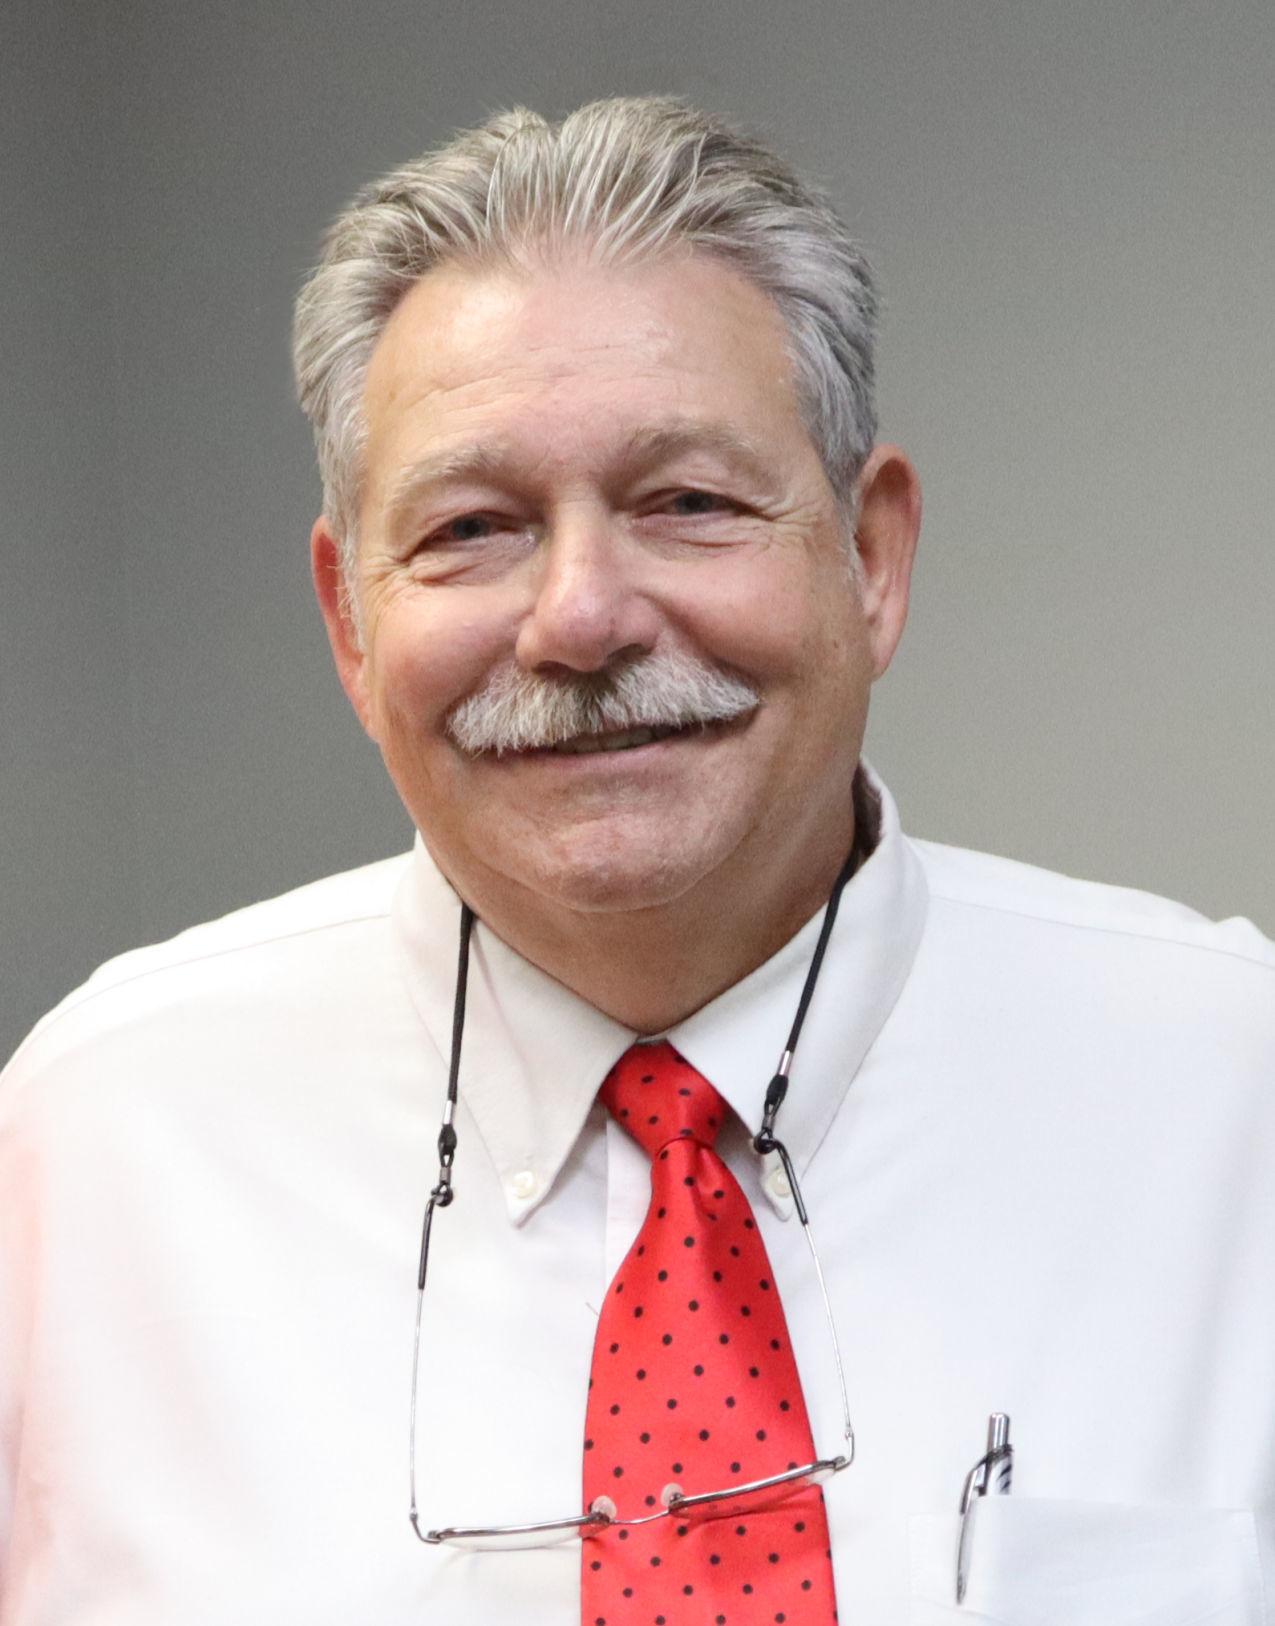 Caroline County Board of Education candidates